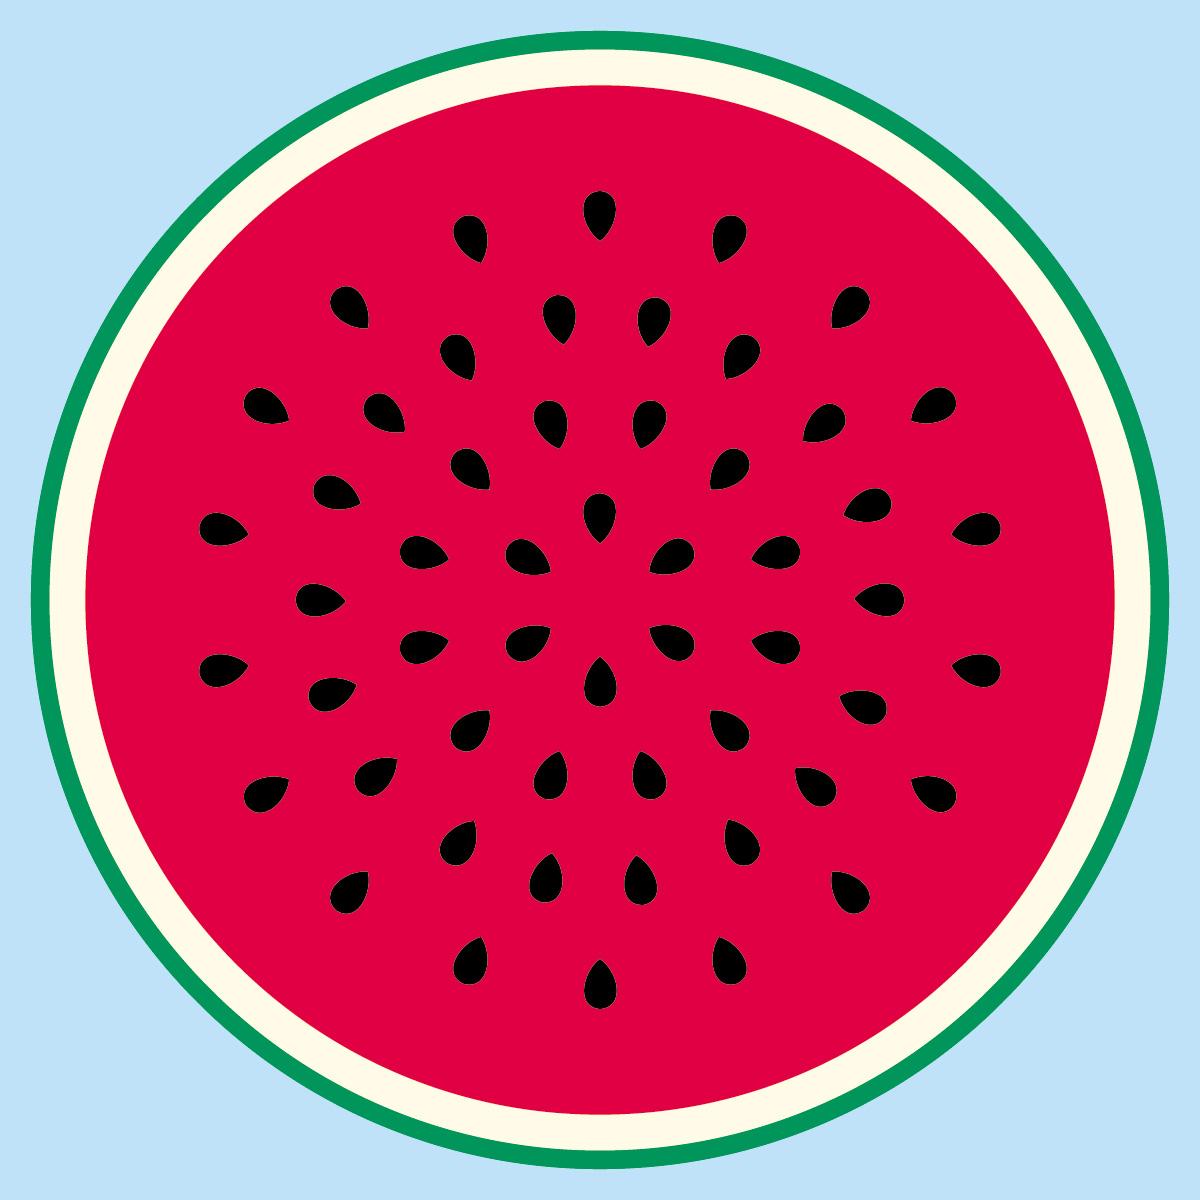 Watermelon Seeds.